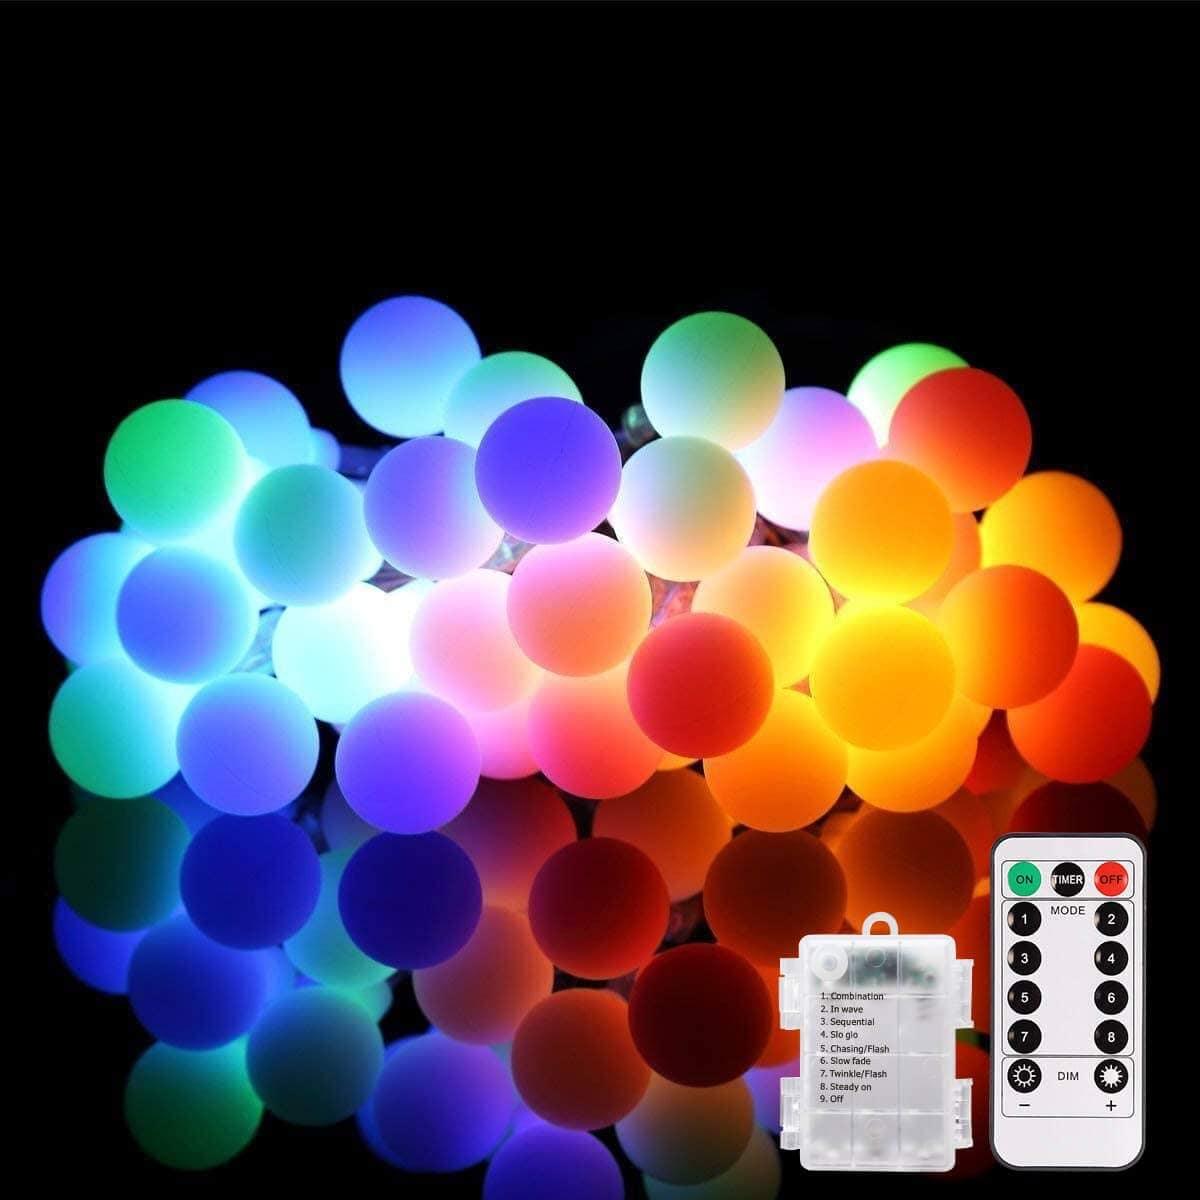 ALOVECO Colorful Globe LED String Lights